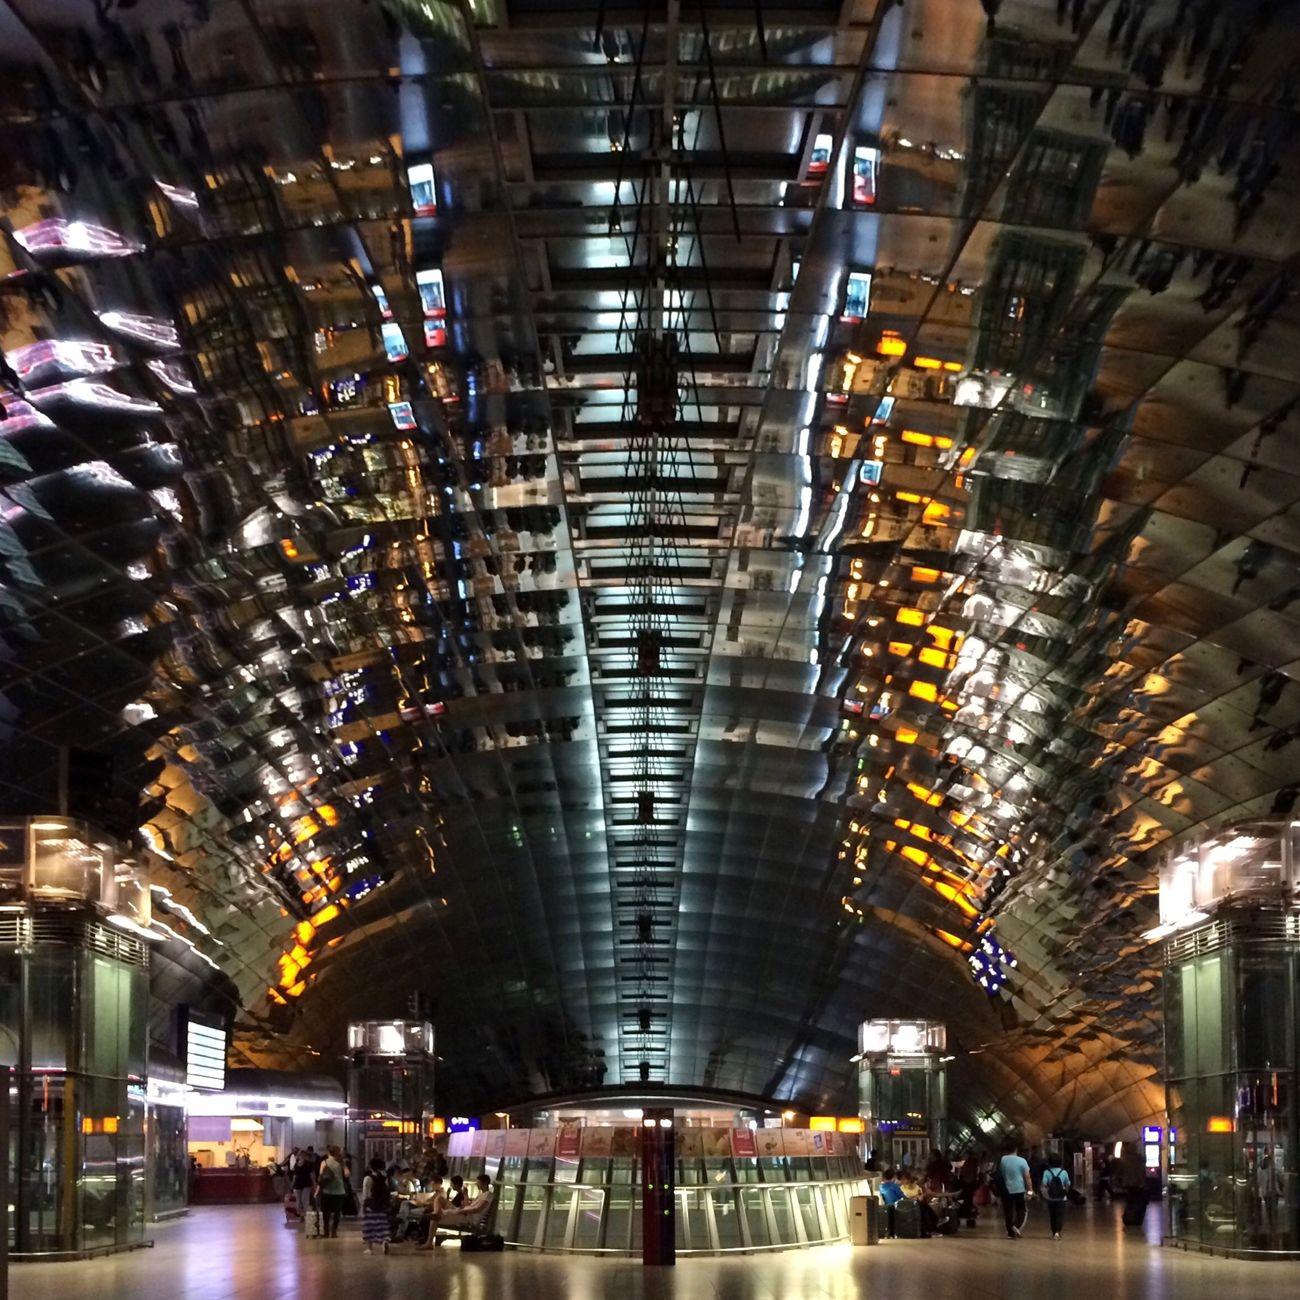 Urban Geometry Architecture The Minimals (less Edit Juxt Photography)